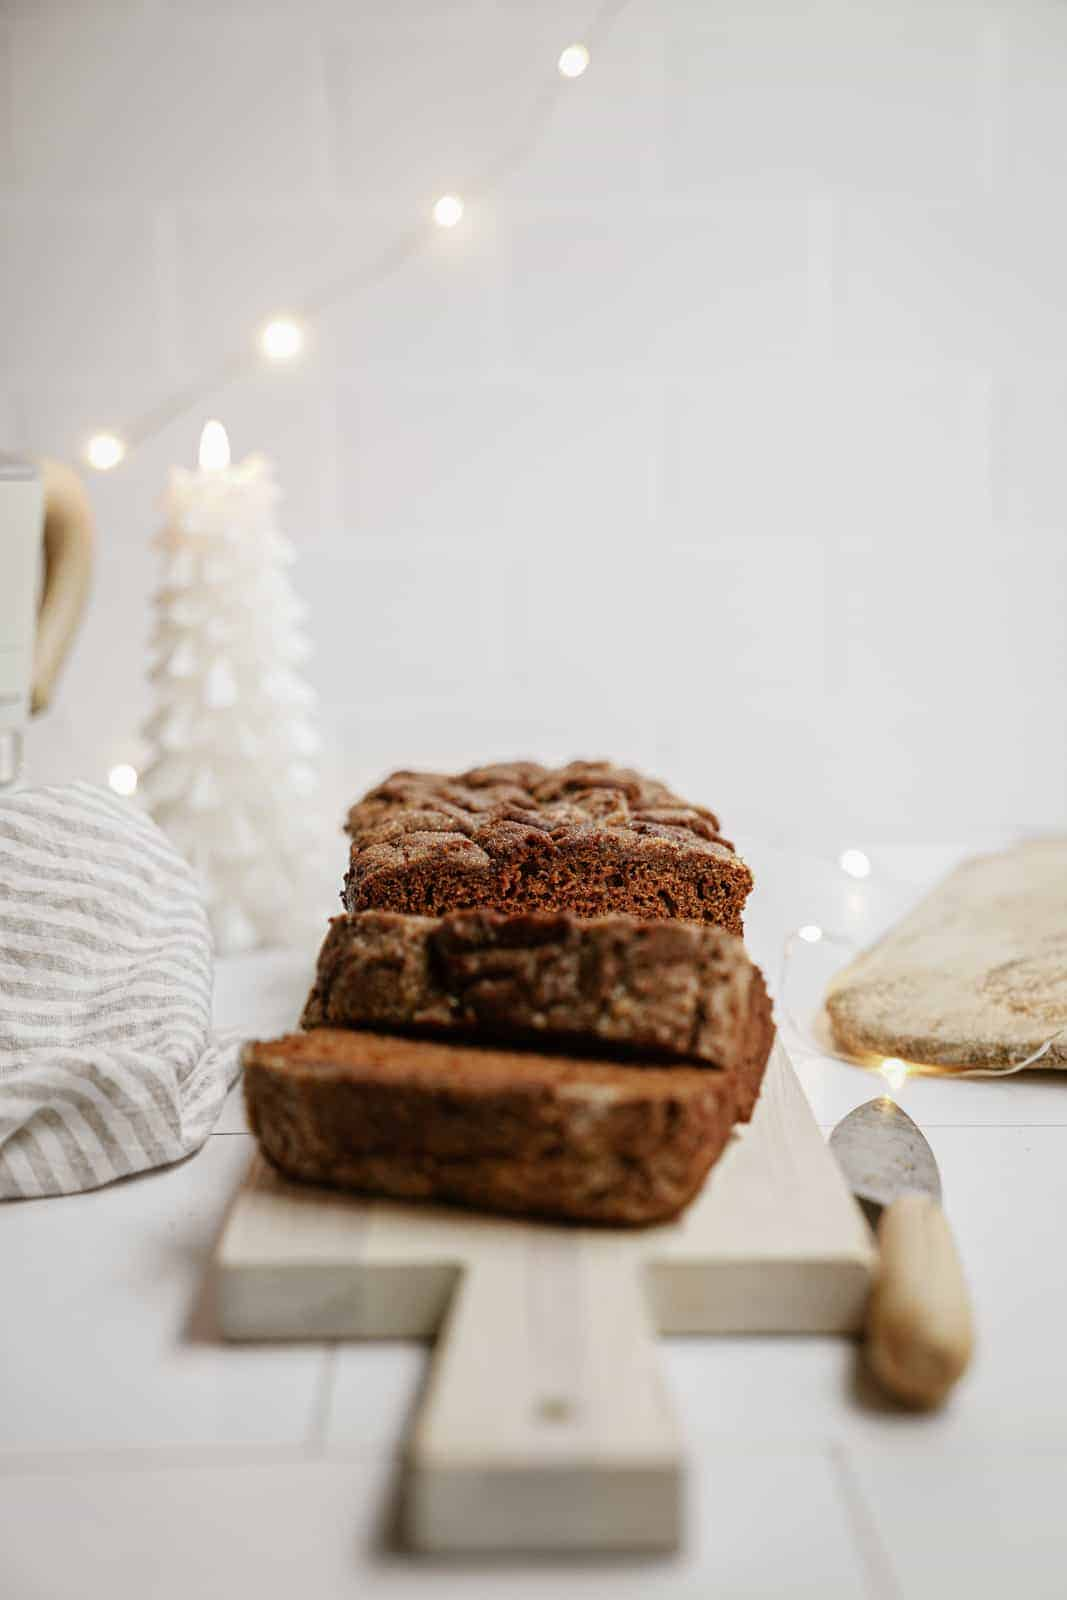 Vegan gingerbread loaf sliced on cutting board.